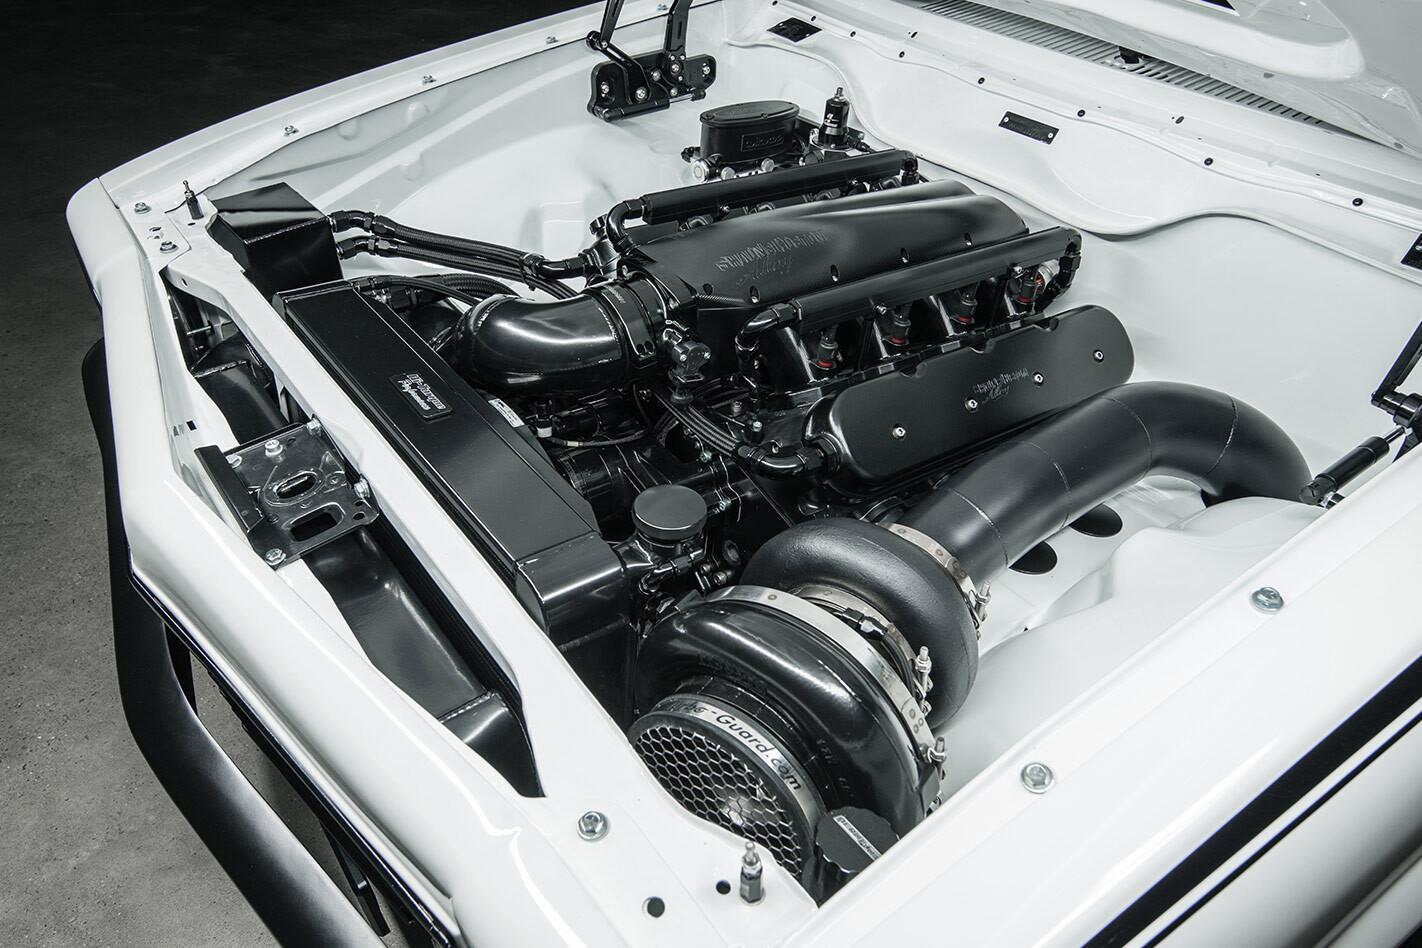 Holden LX Torana LSX engine